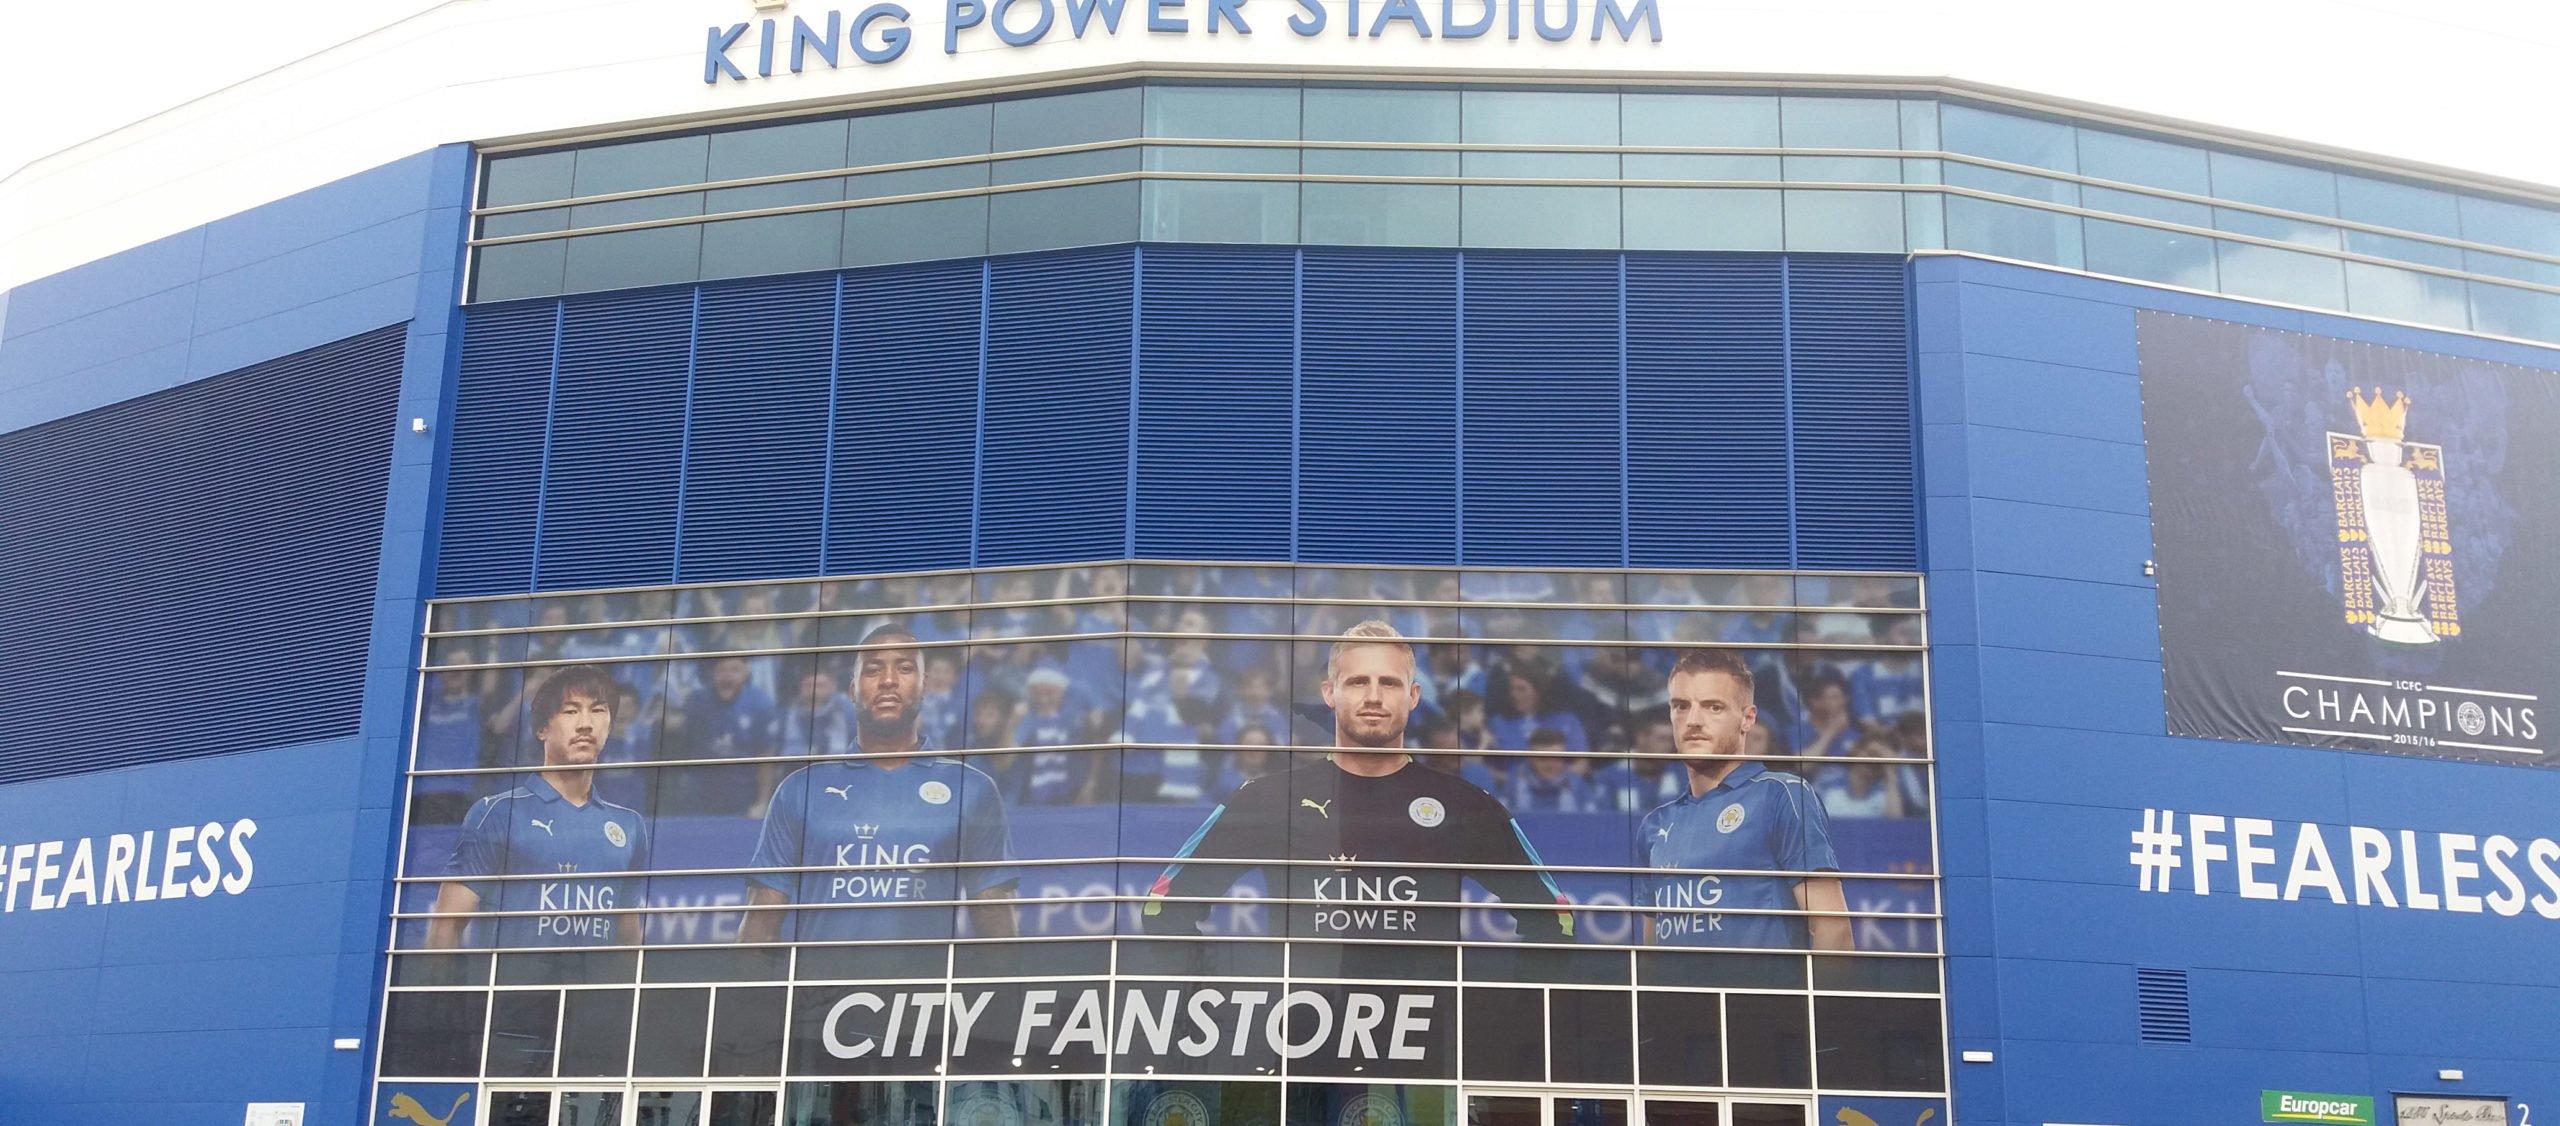 fanstore-fearless-king-power-stadium-stadion